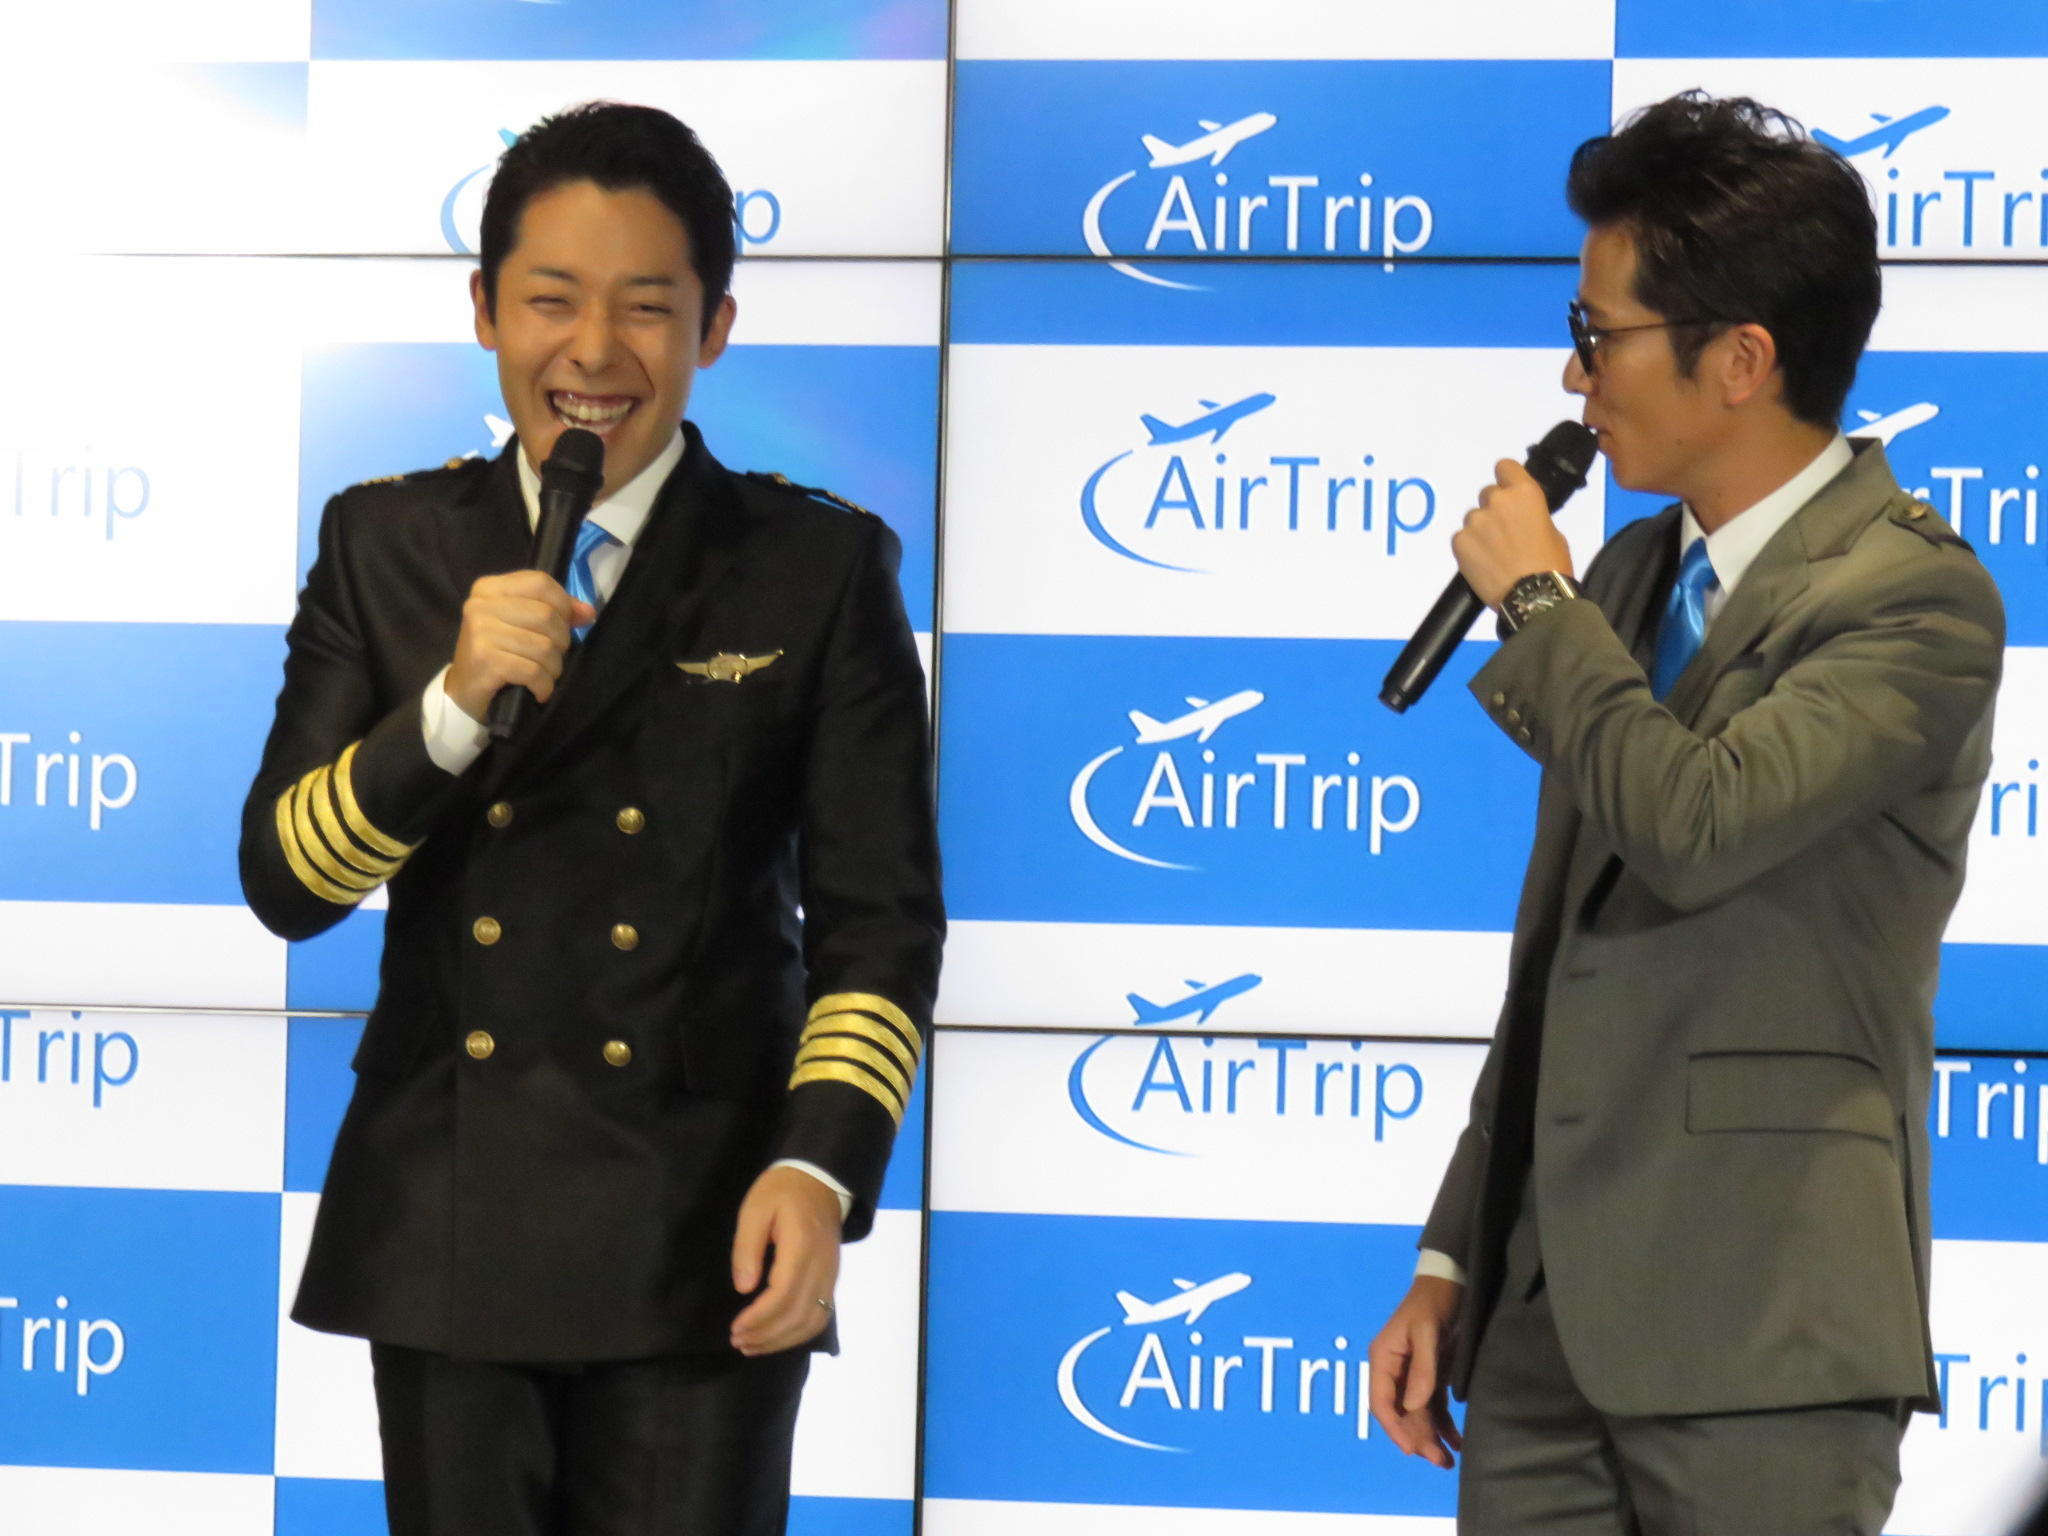 http://news.yoshimoto.co.jp/20170911191658-5e15d58a7cf02d8d5eb0f9ed8efcd7c9d5f1b011.jpg